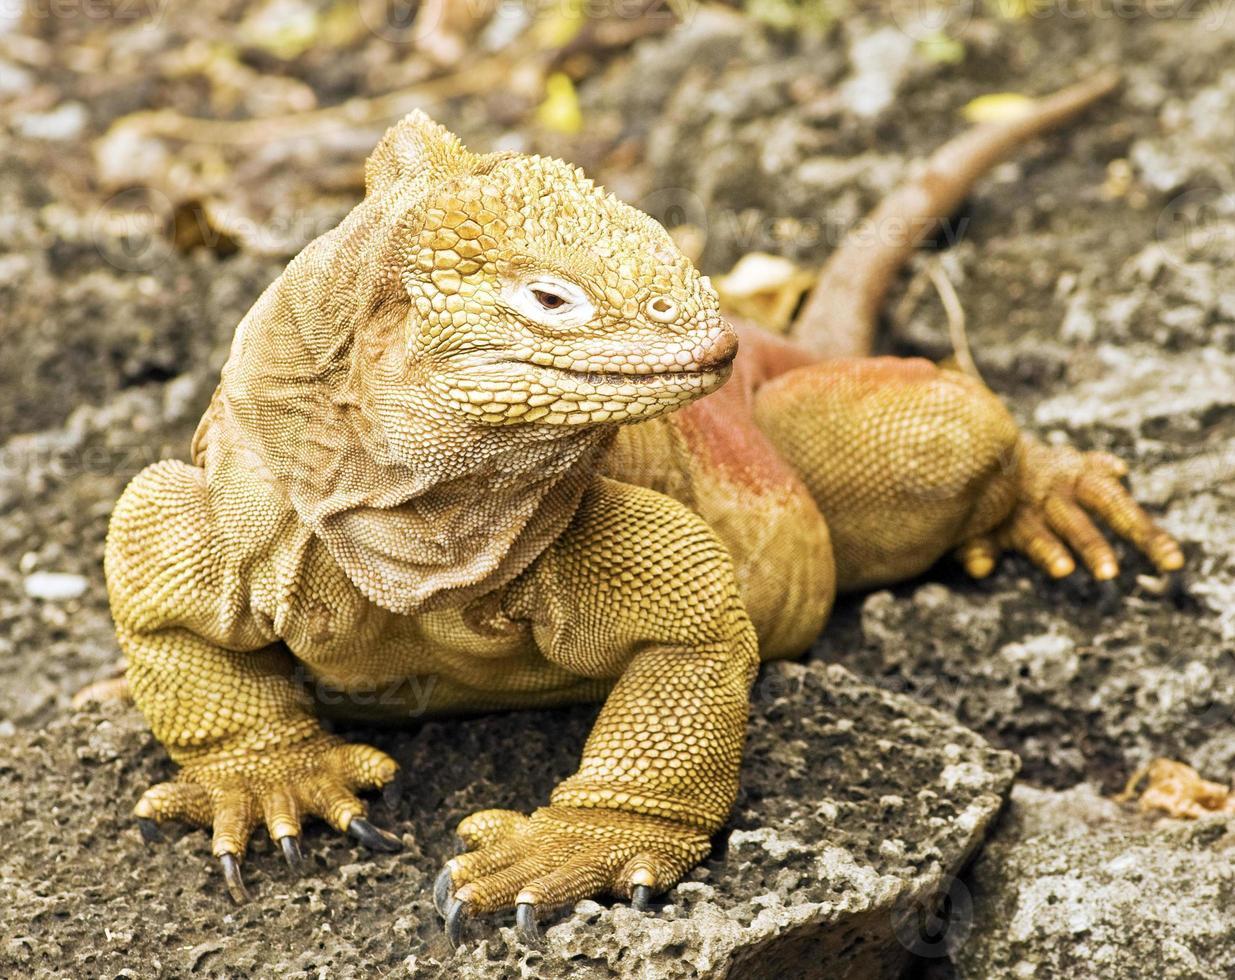 Galapagos Land Iguana (Conolophus Subcristatus) photo